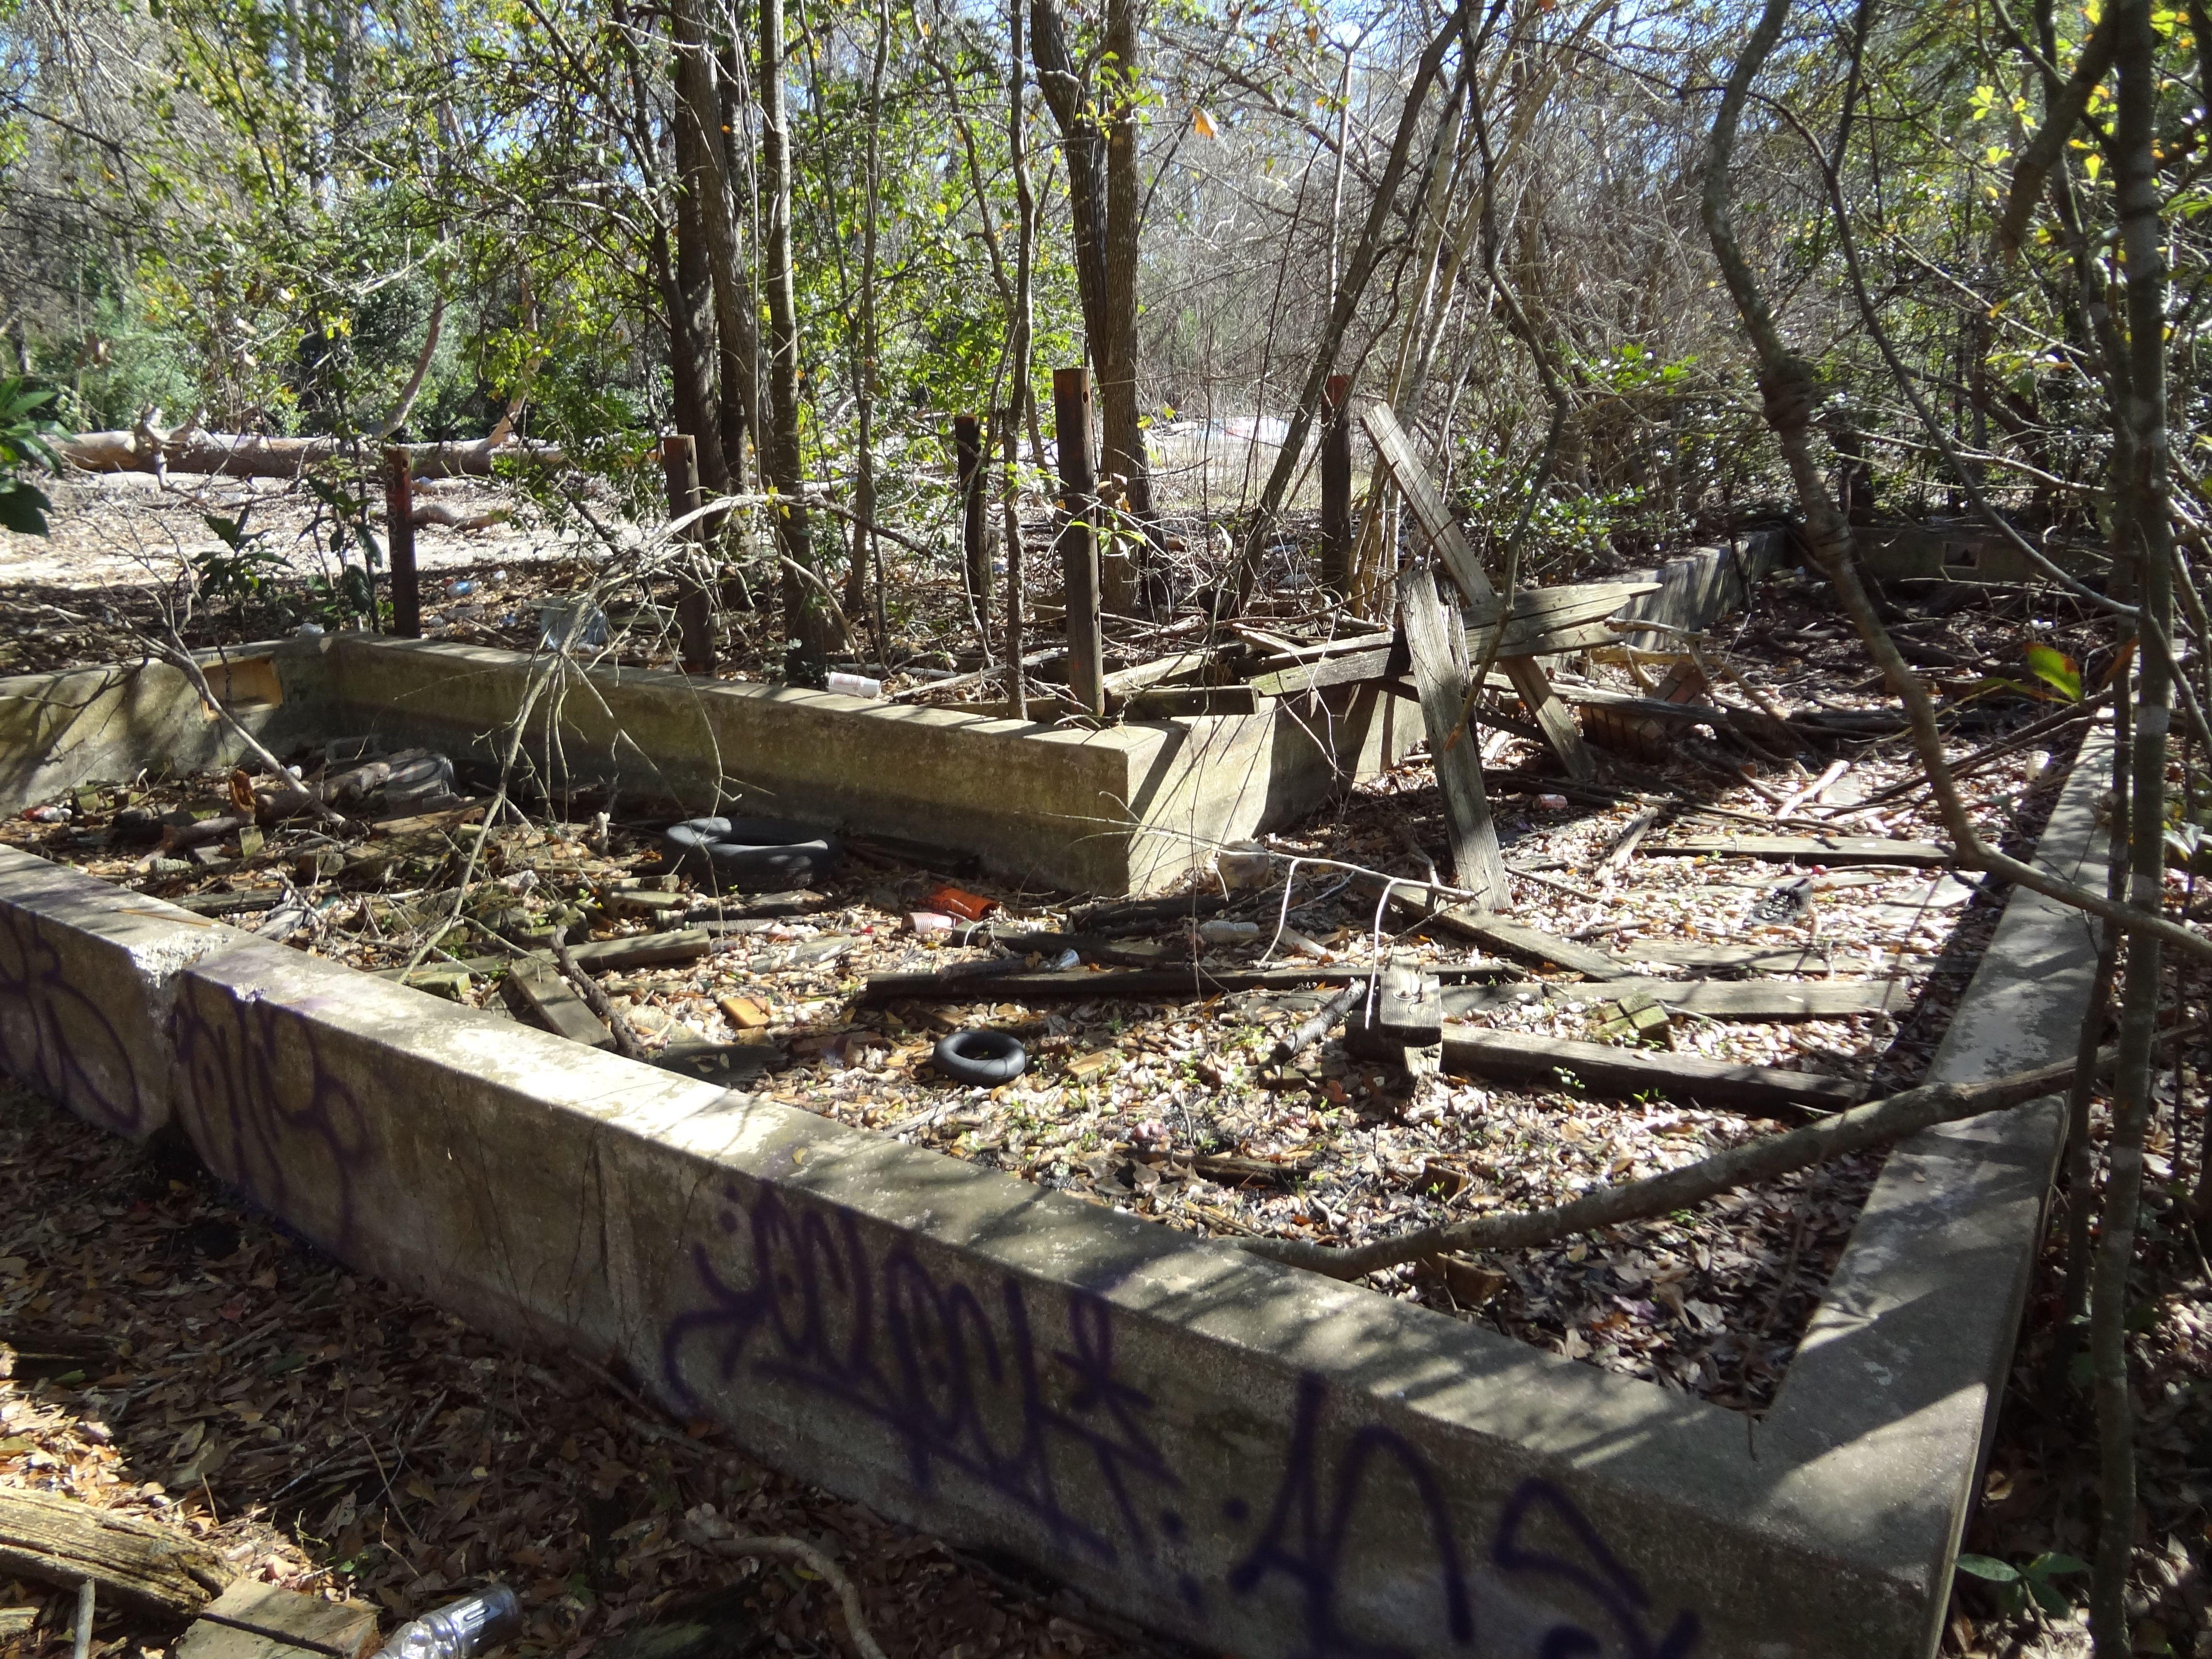 More slab ruins. Water slides, Foreclosures, Batting cages